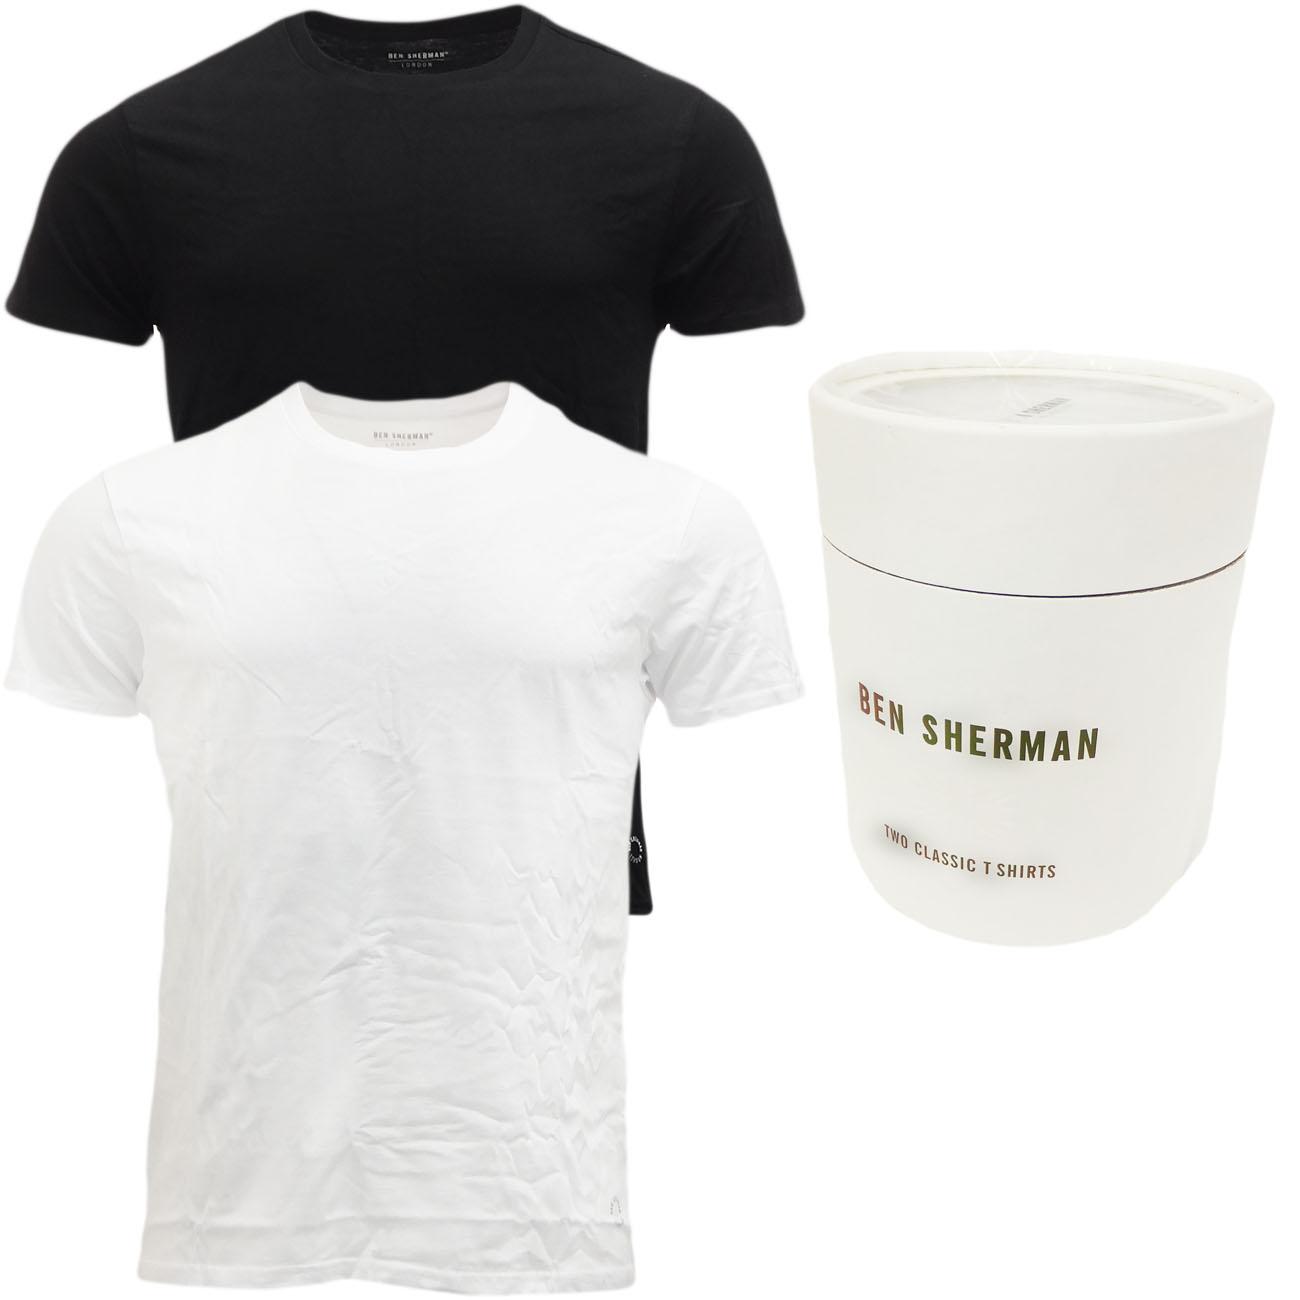 Mens ben sherman t shirt gift box pack of 2 plain t shirts for Plain t shirt pack